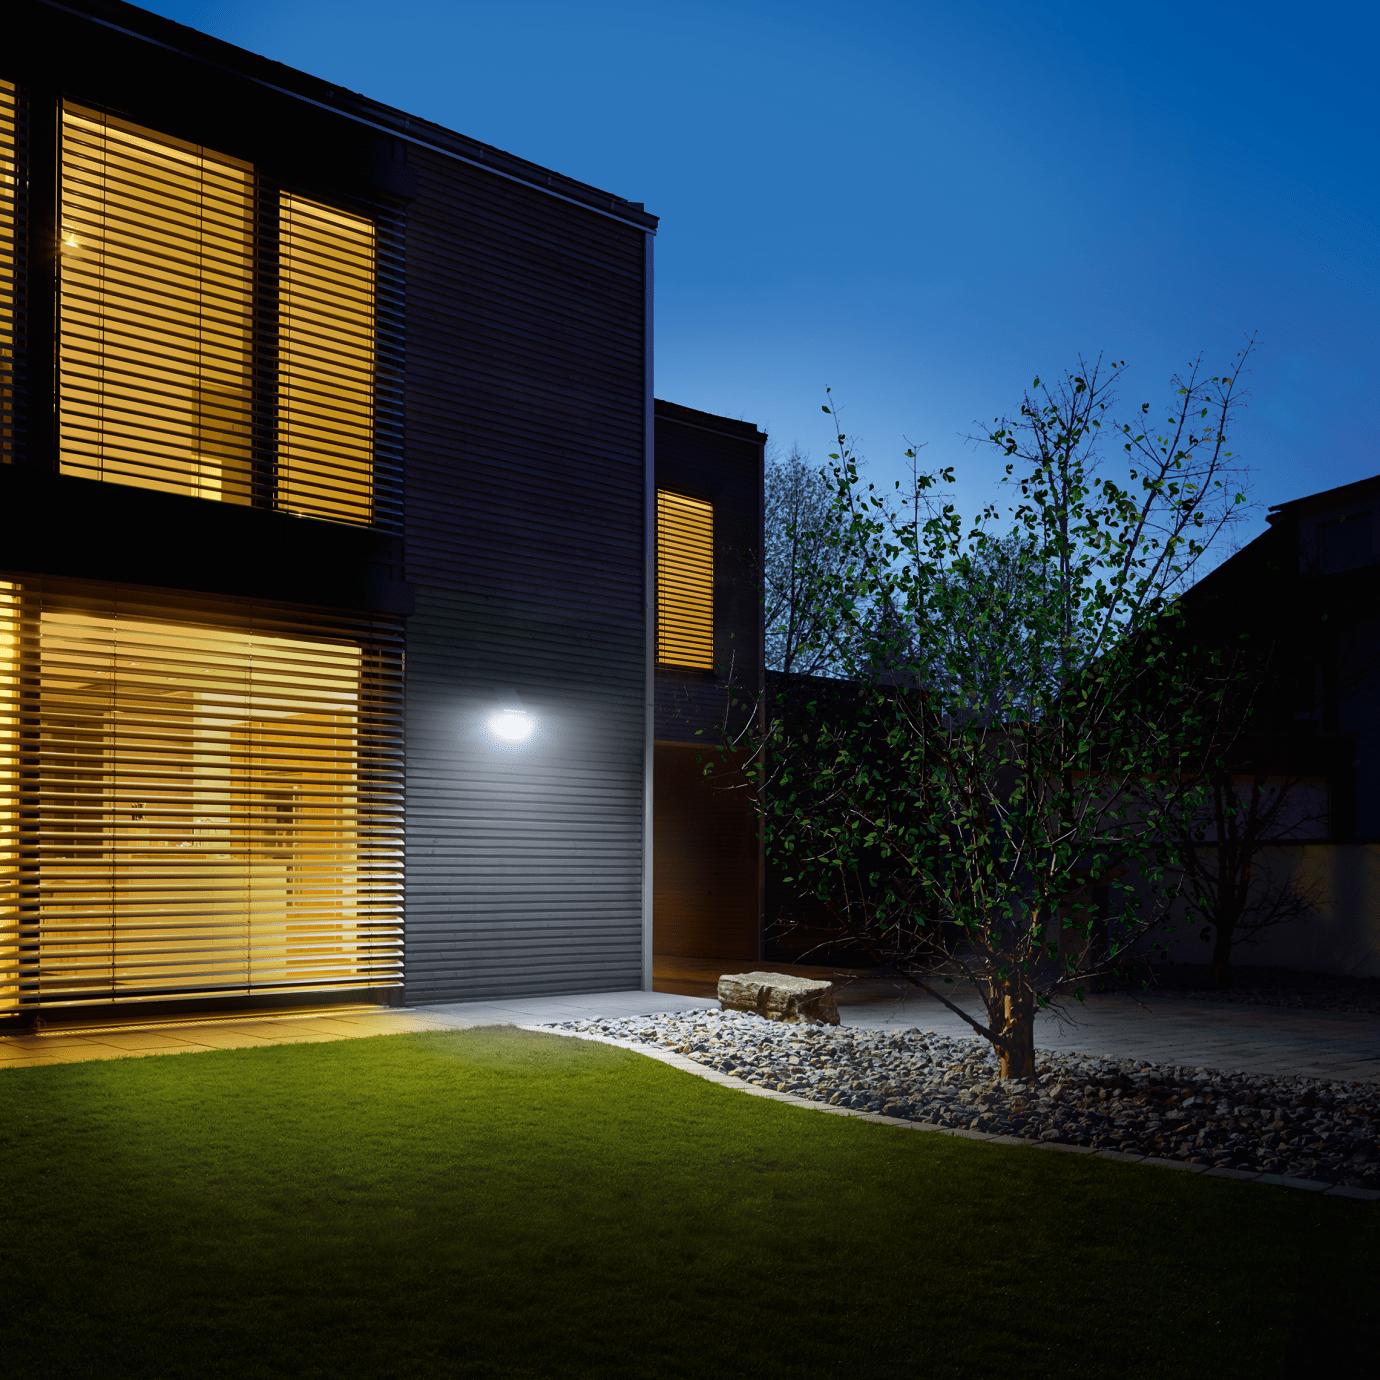 Solarbeleuchtung im Sommer am Haus